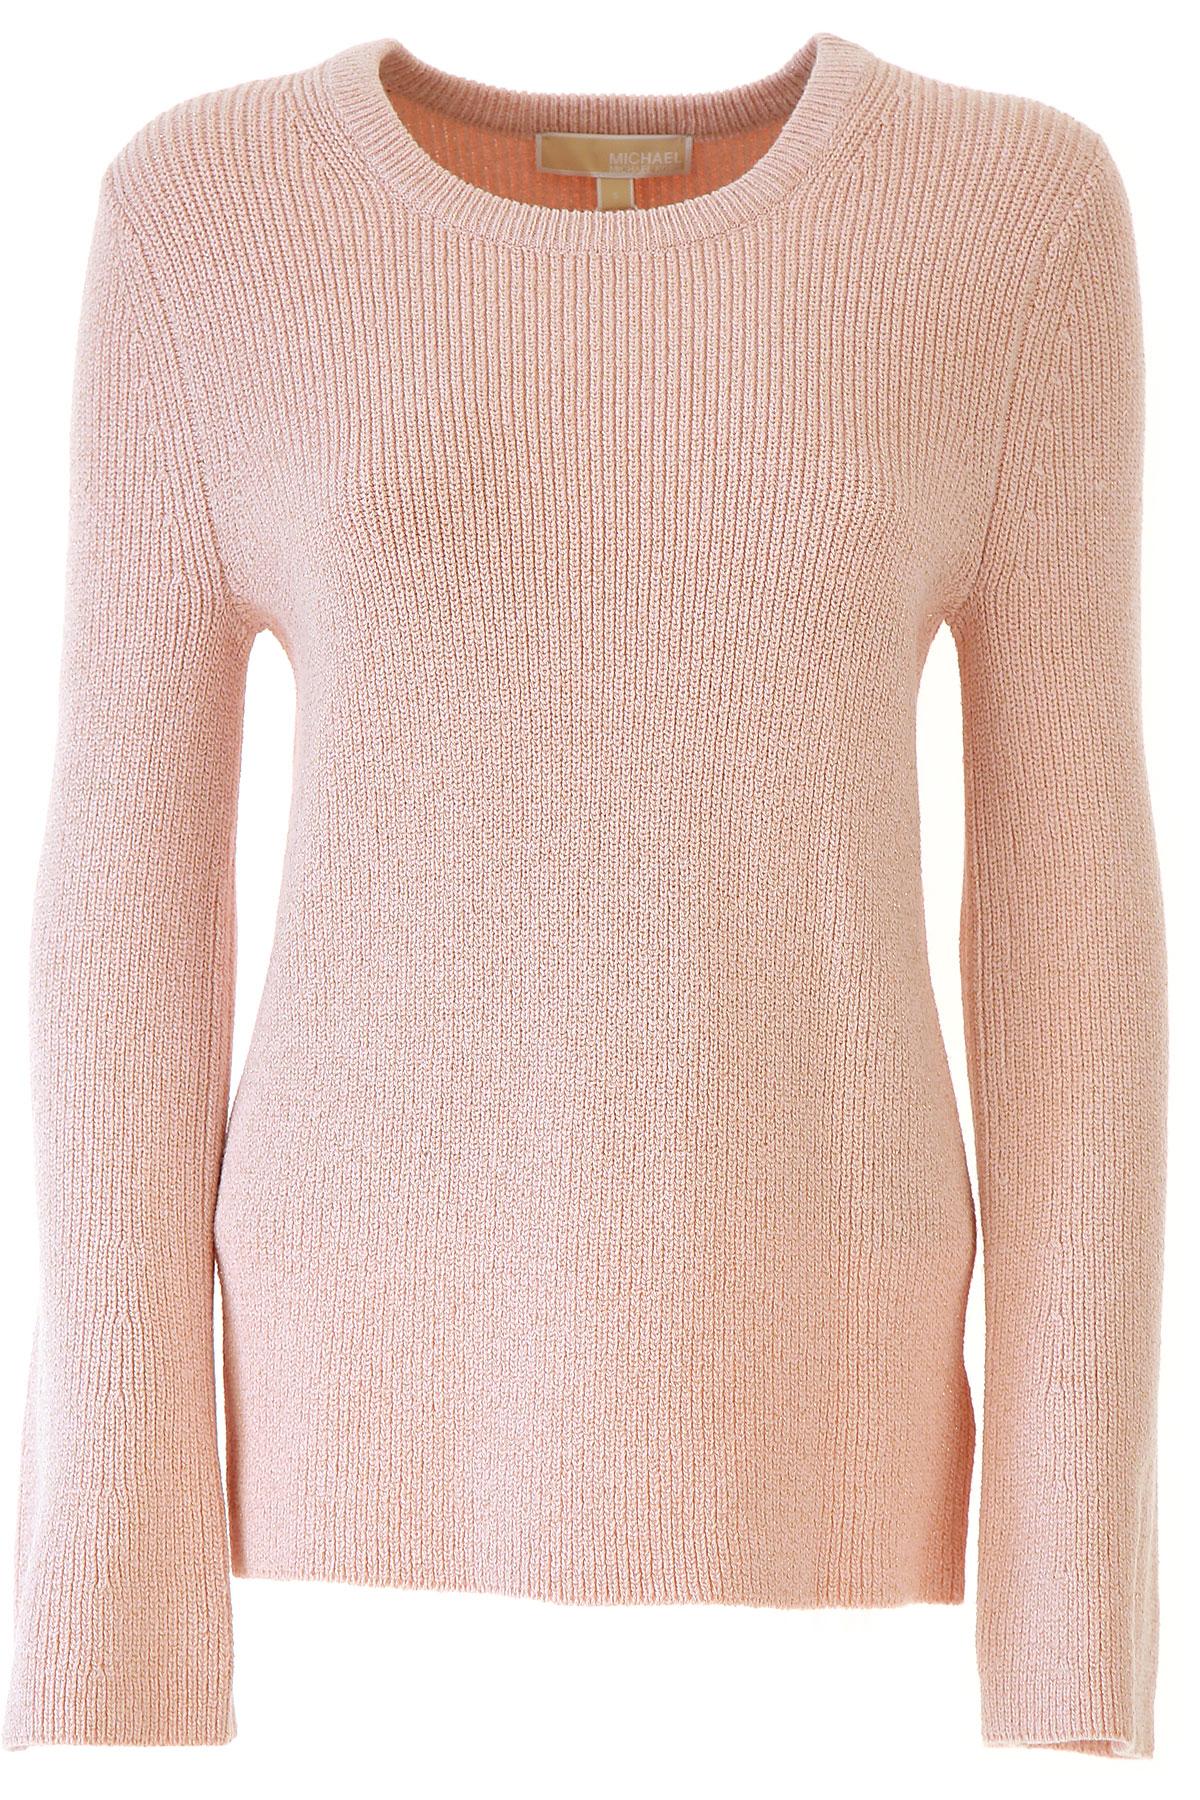 Womens Clothing Michael Kors Style code mu76nbp4ve 683